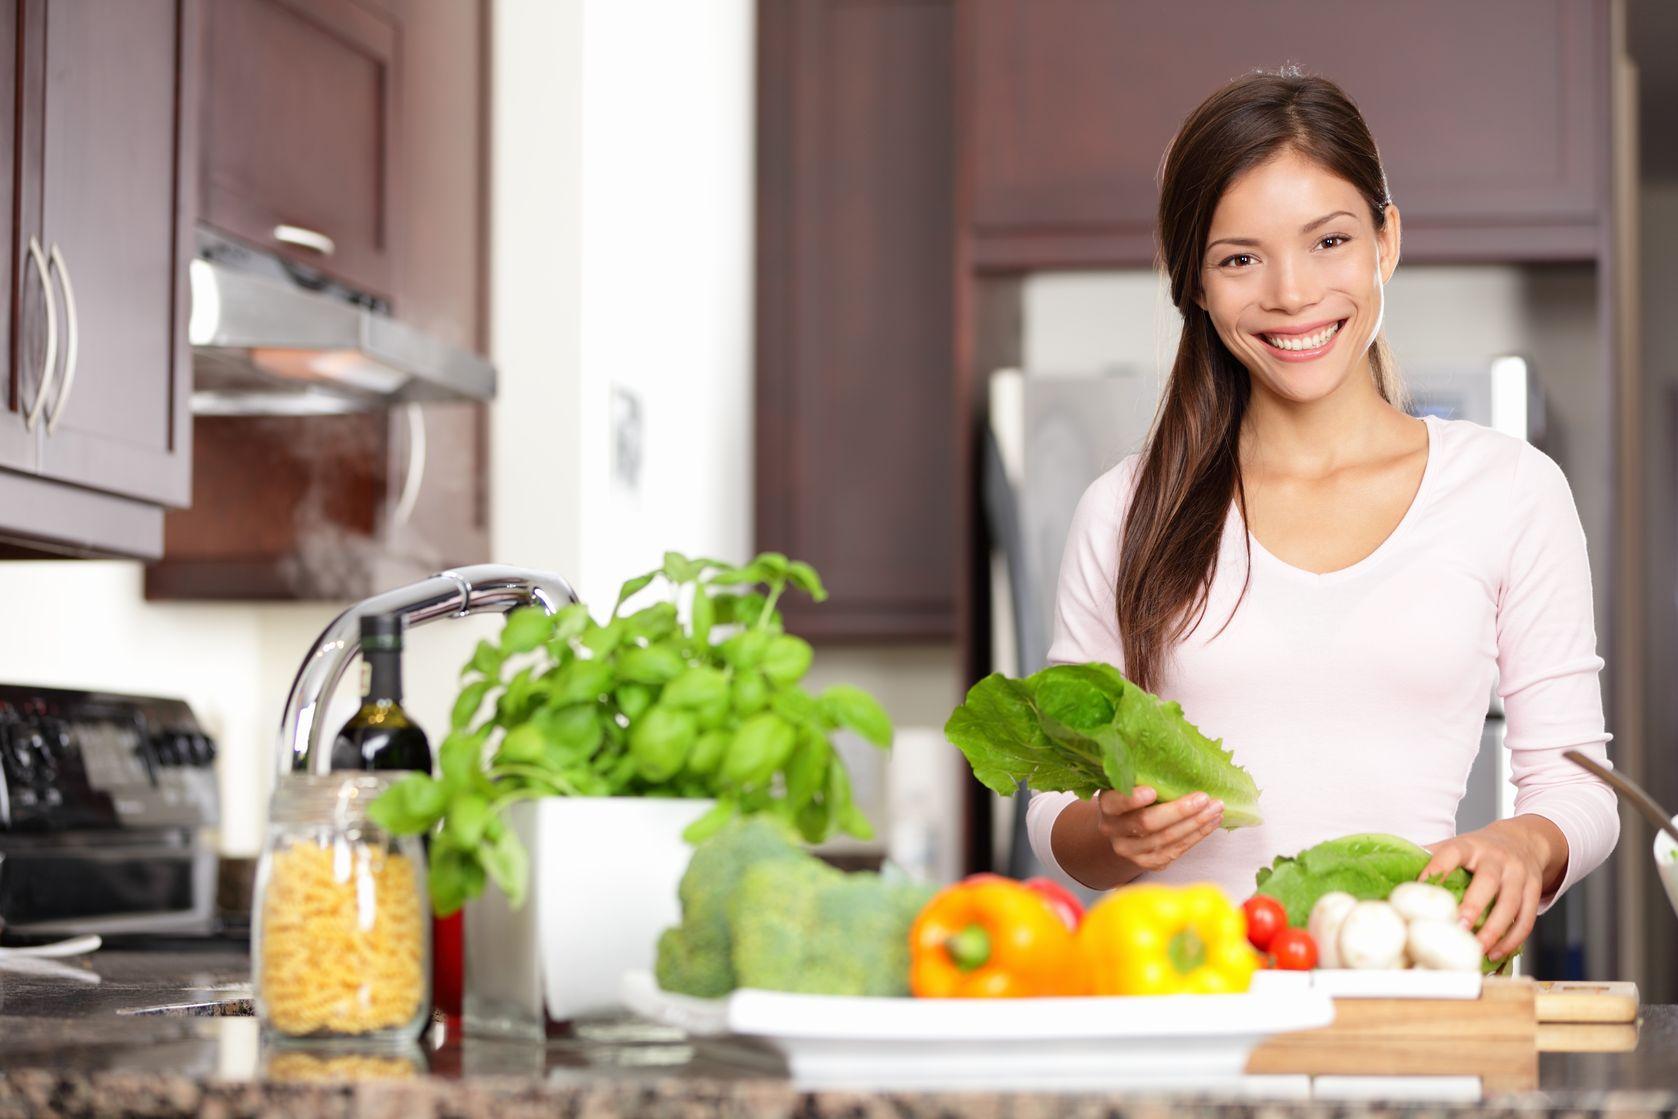 Dorra Slim 5 ways to detox your body extra large size